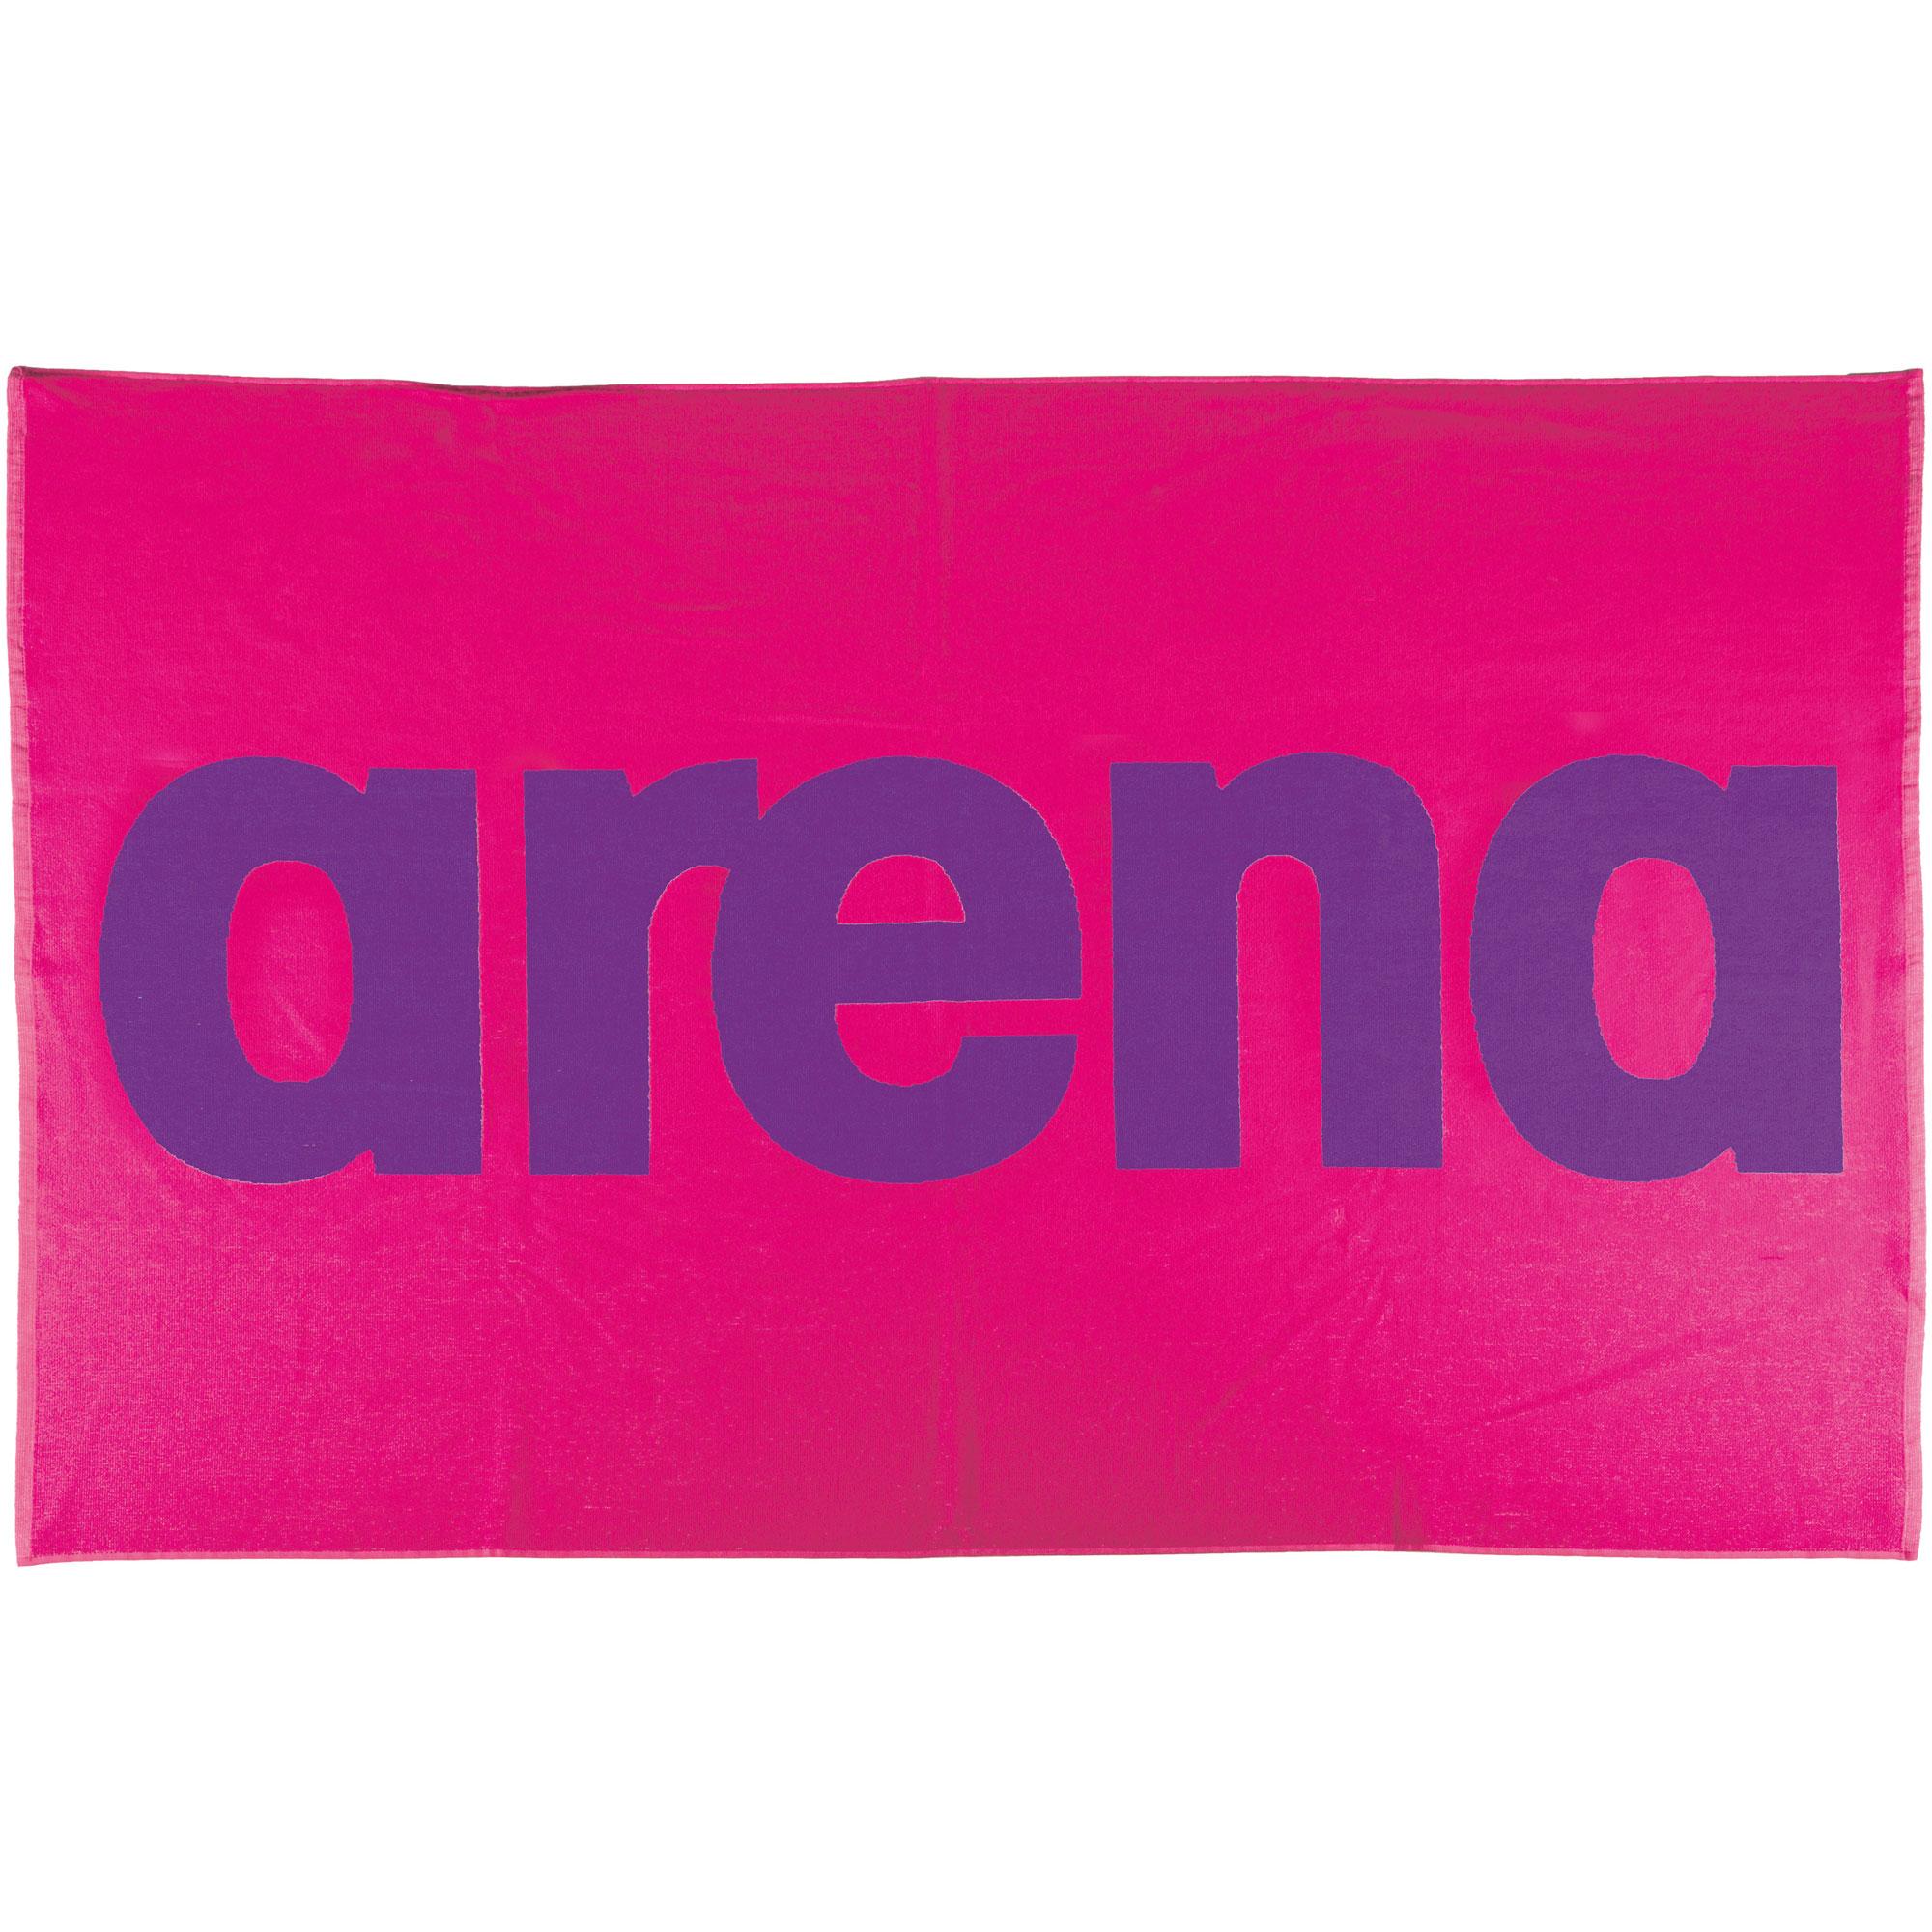 Arena Handtuch groß Handy 2A490-909